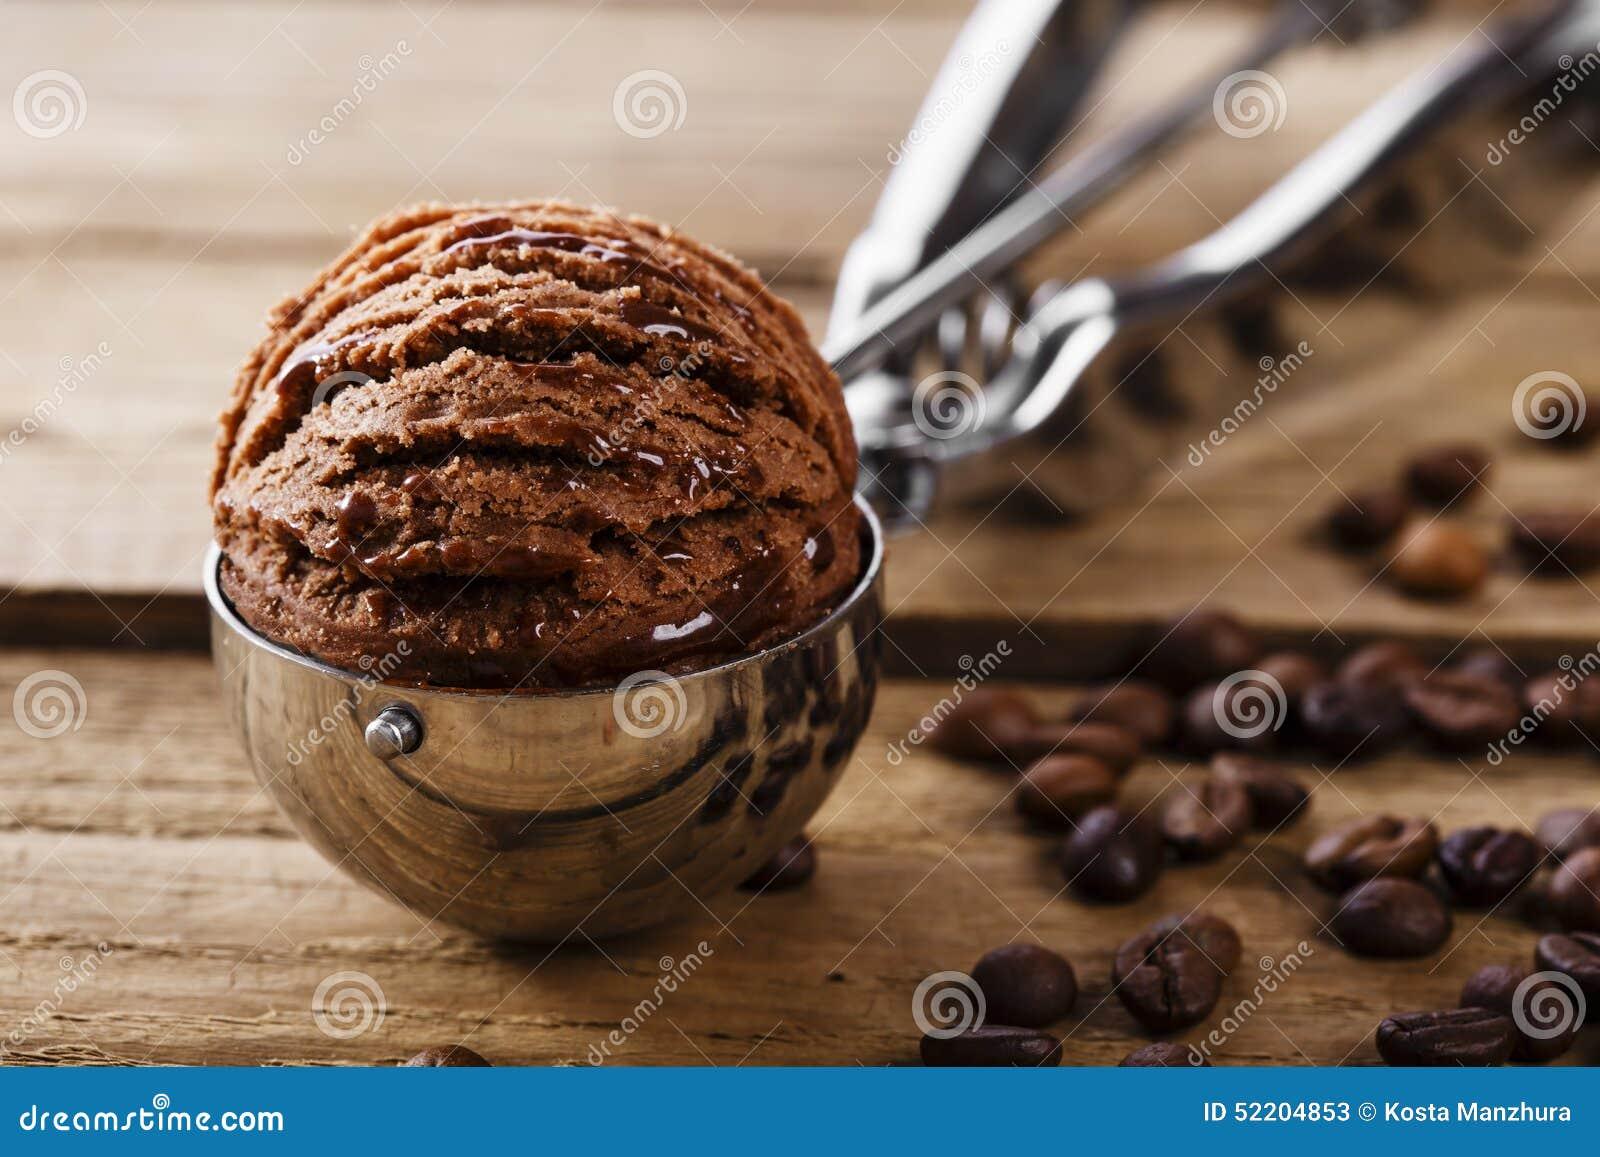 Chocolate Coffee Ice Cream Ball Stock Photo - Image: 52204853